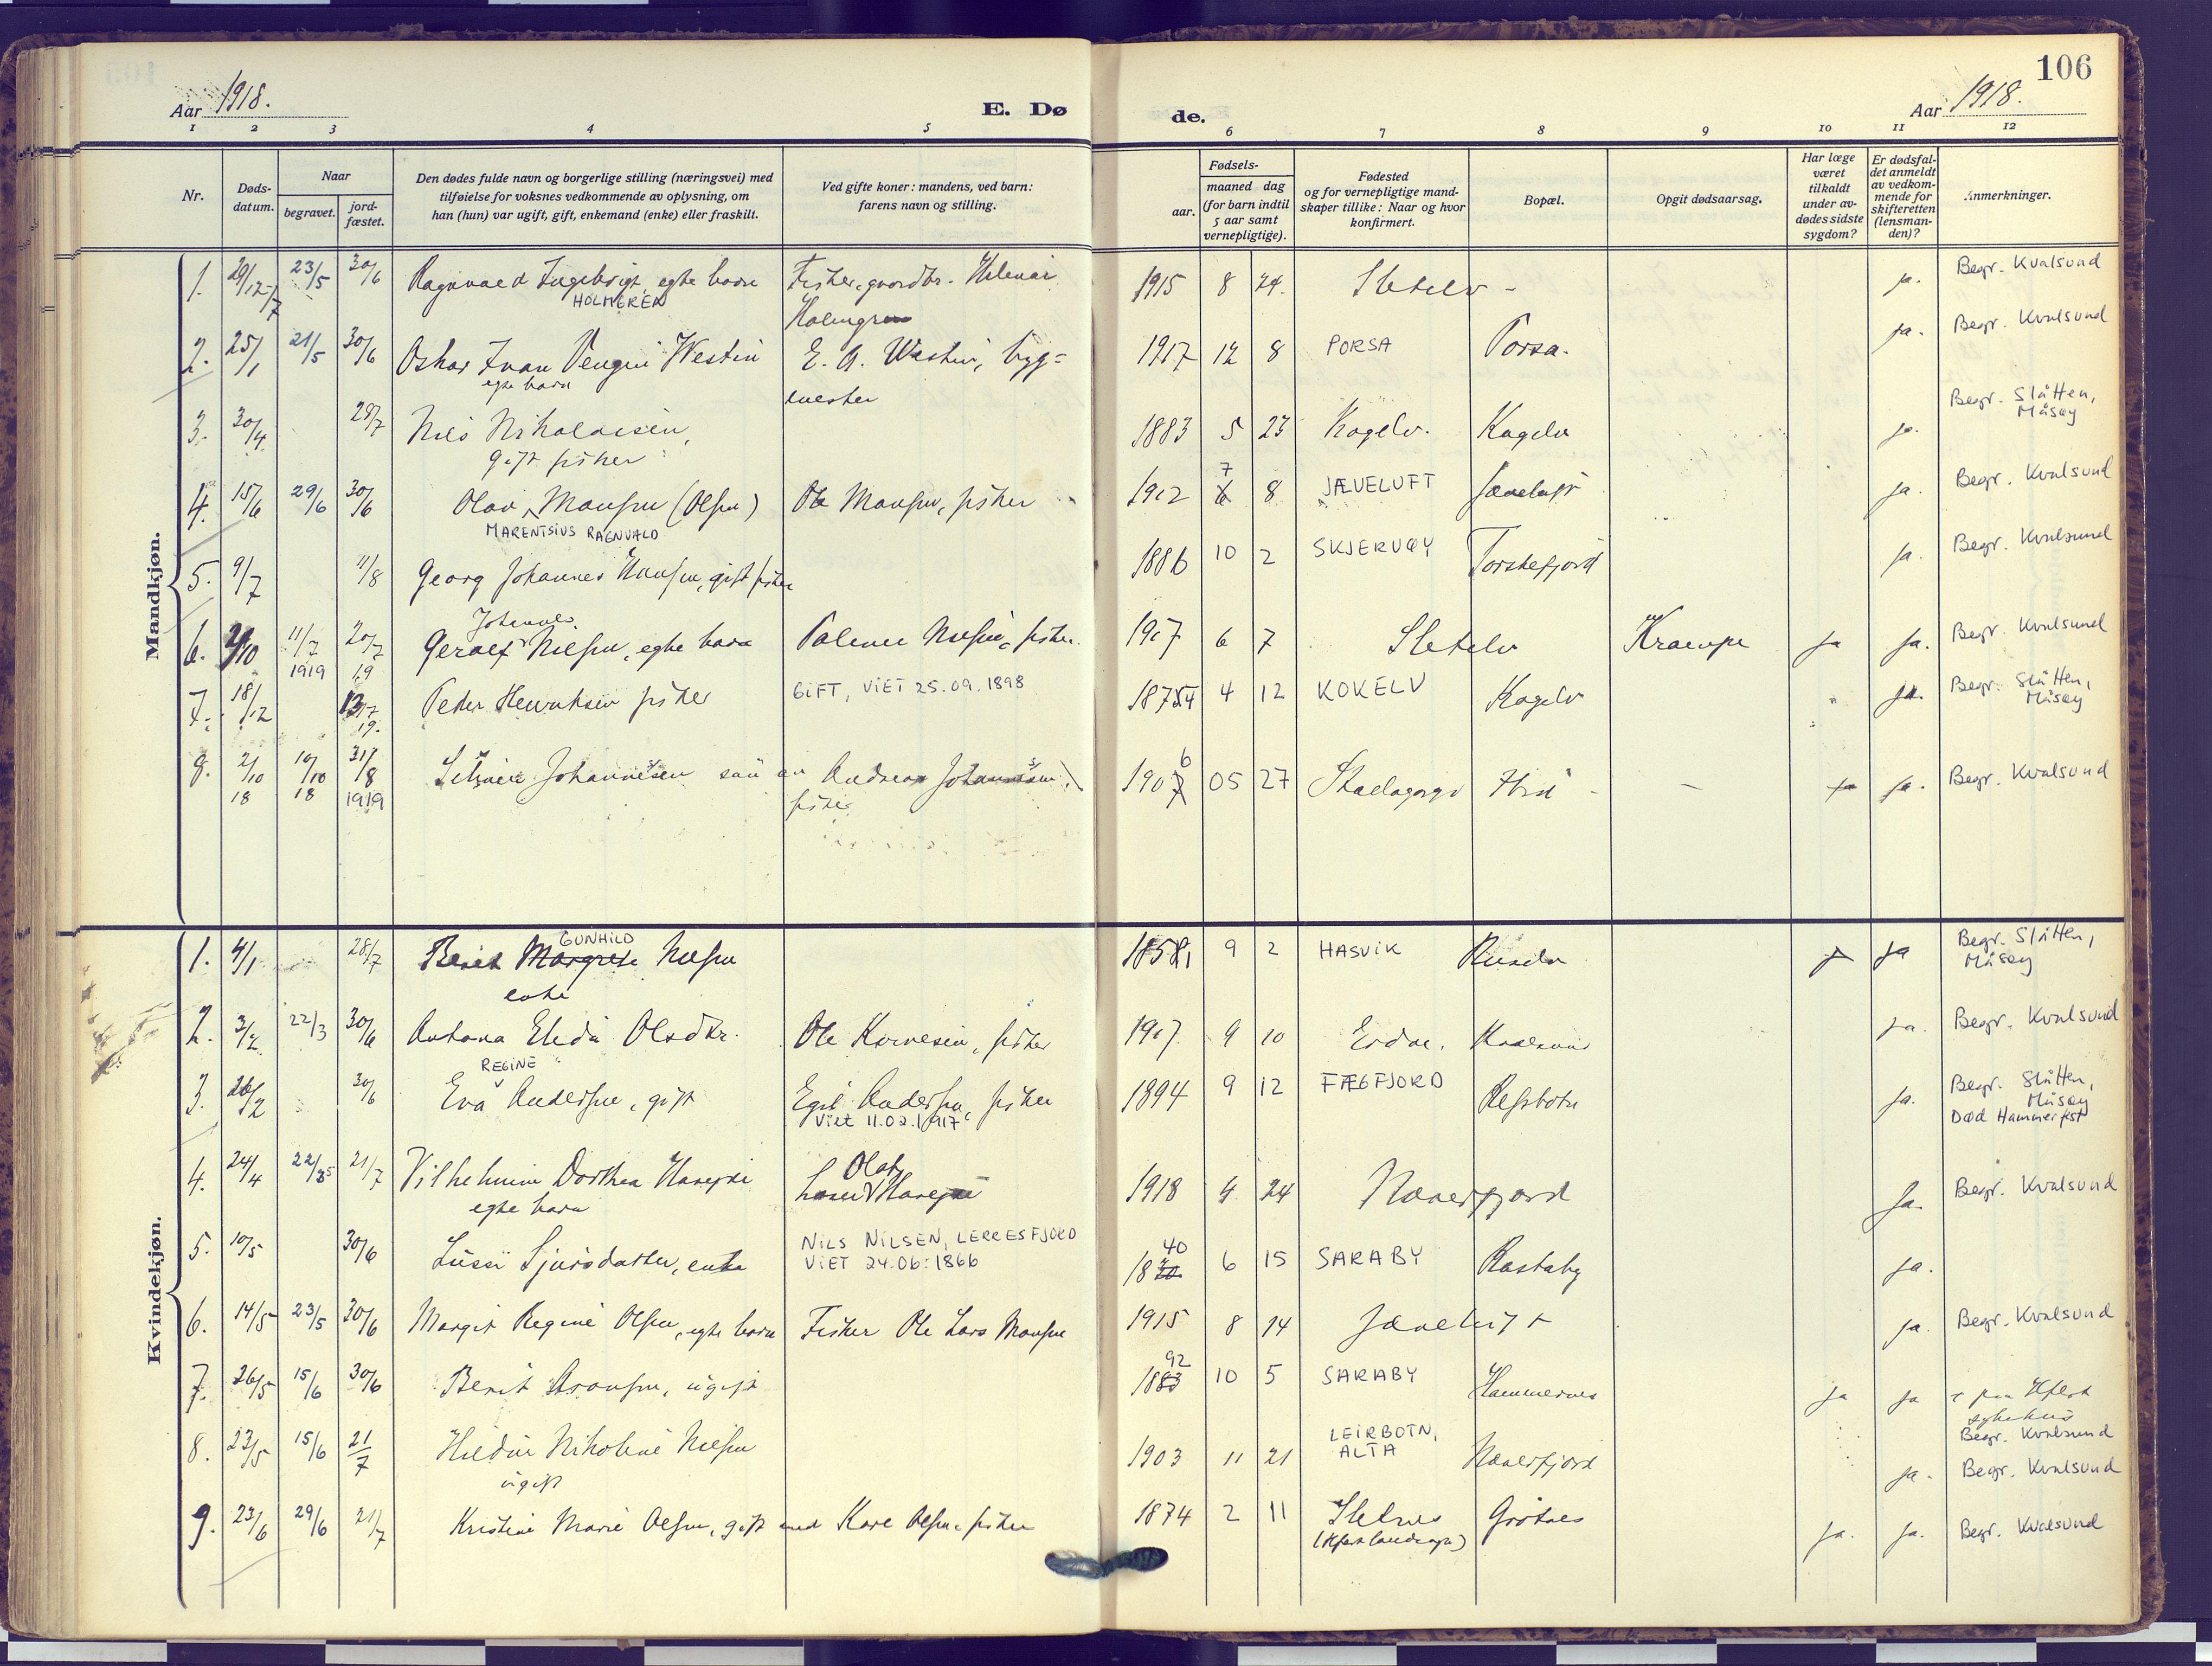 SATØ, Hammerfest sokneprestembete, Ministerialbok nr. 16, 1908-1923, s. 106